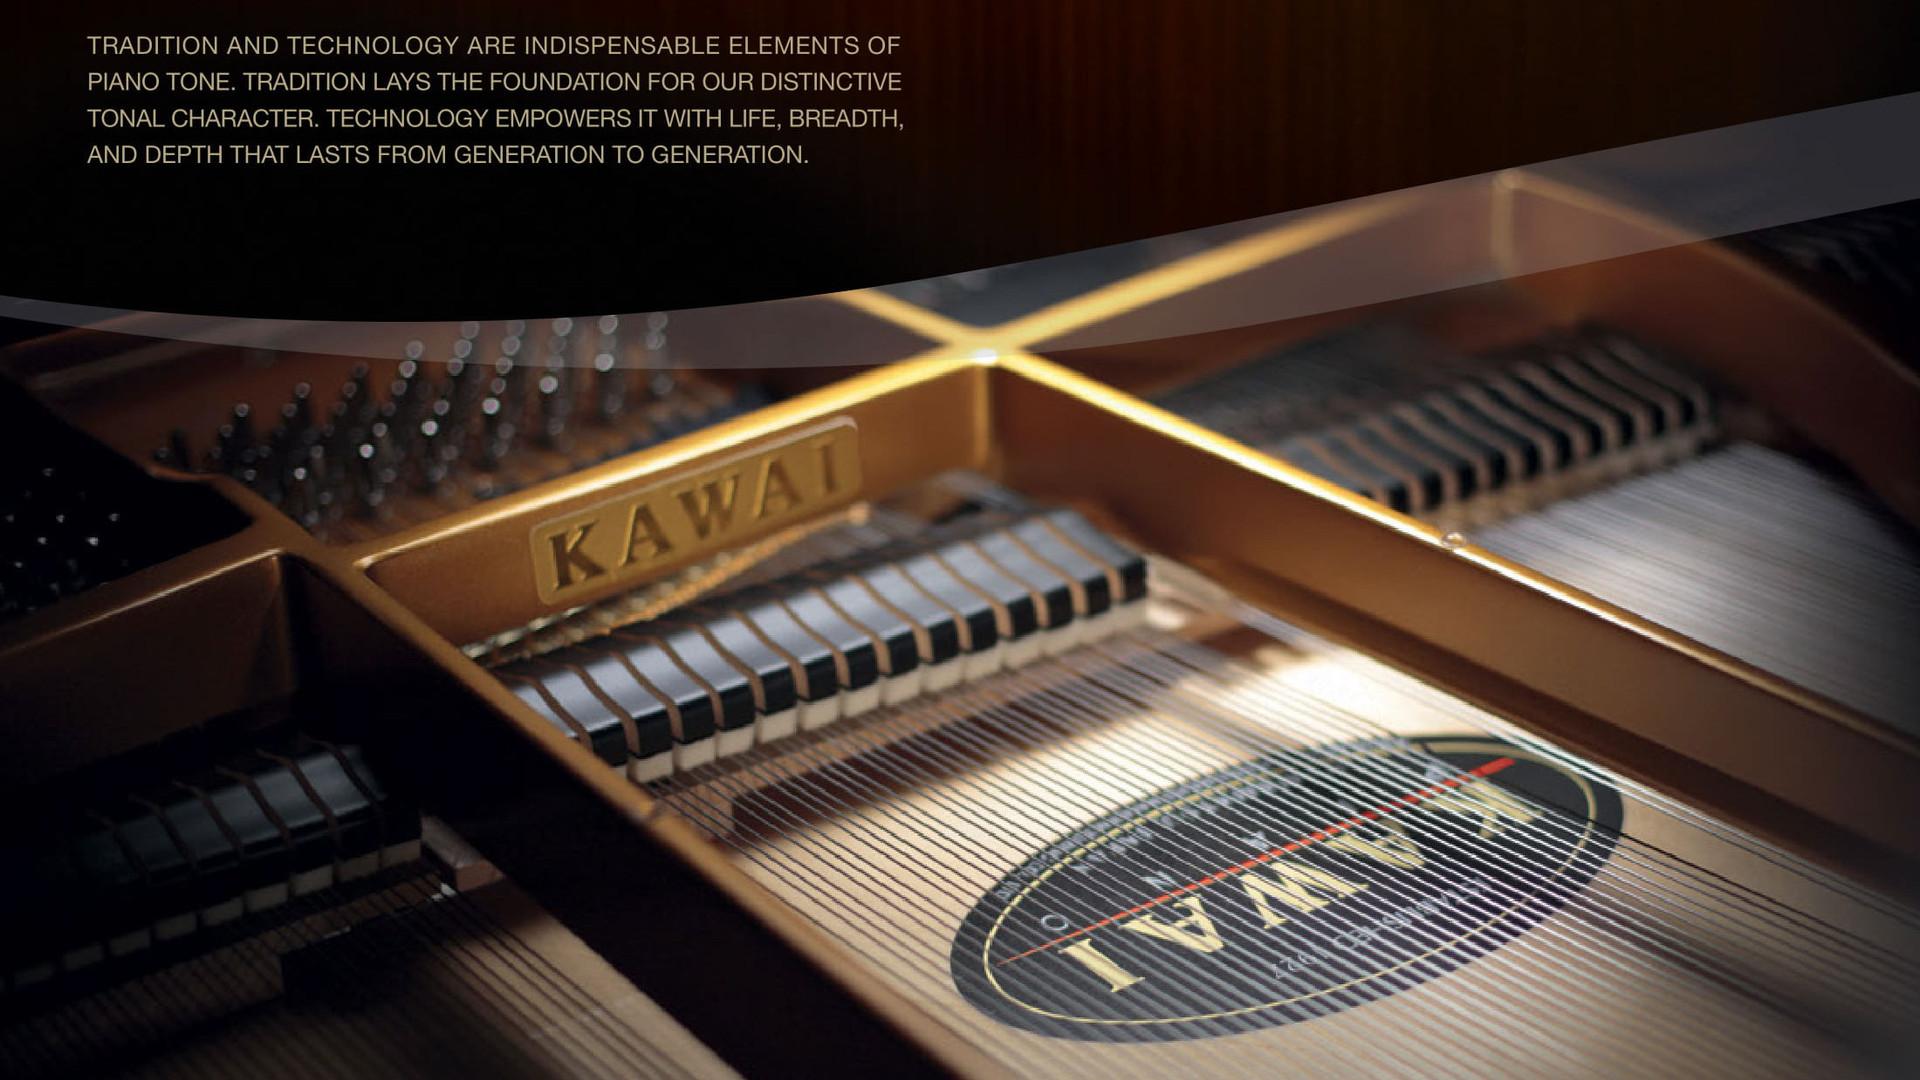 Kawai-Brochure-6.jpg